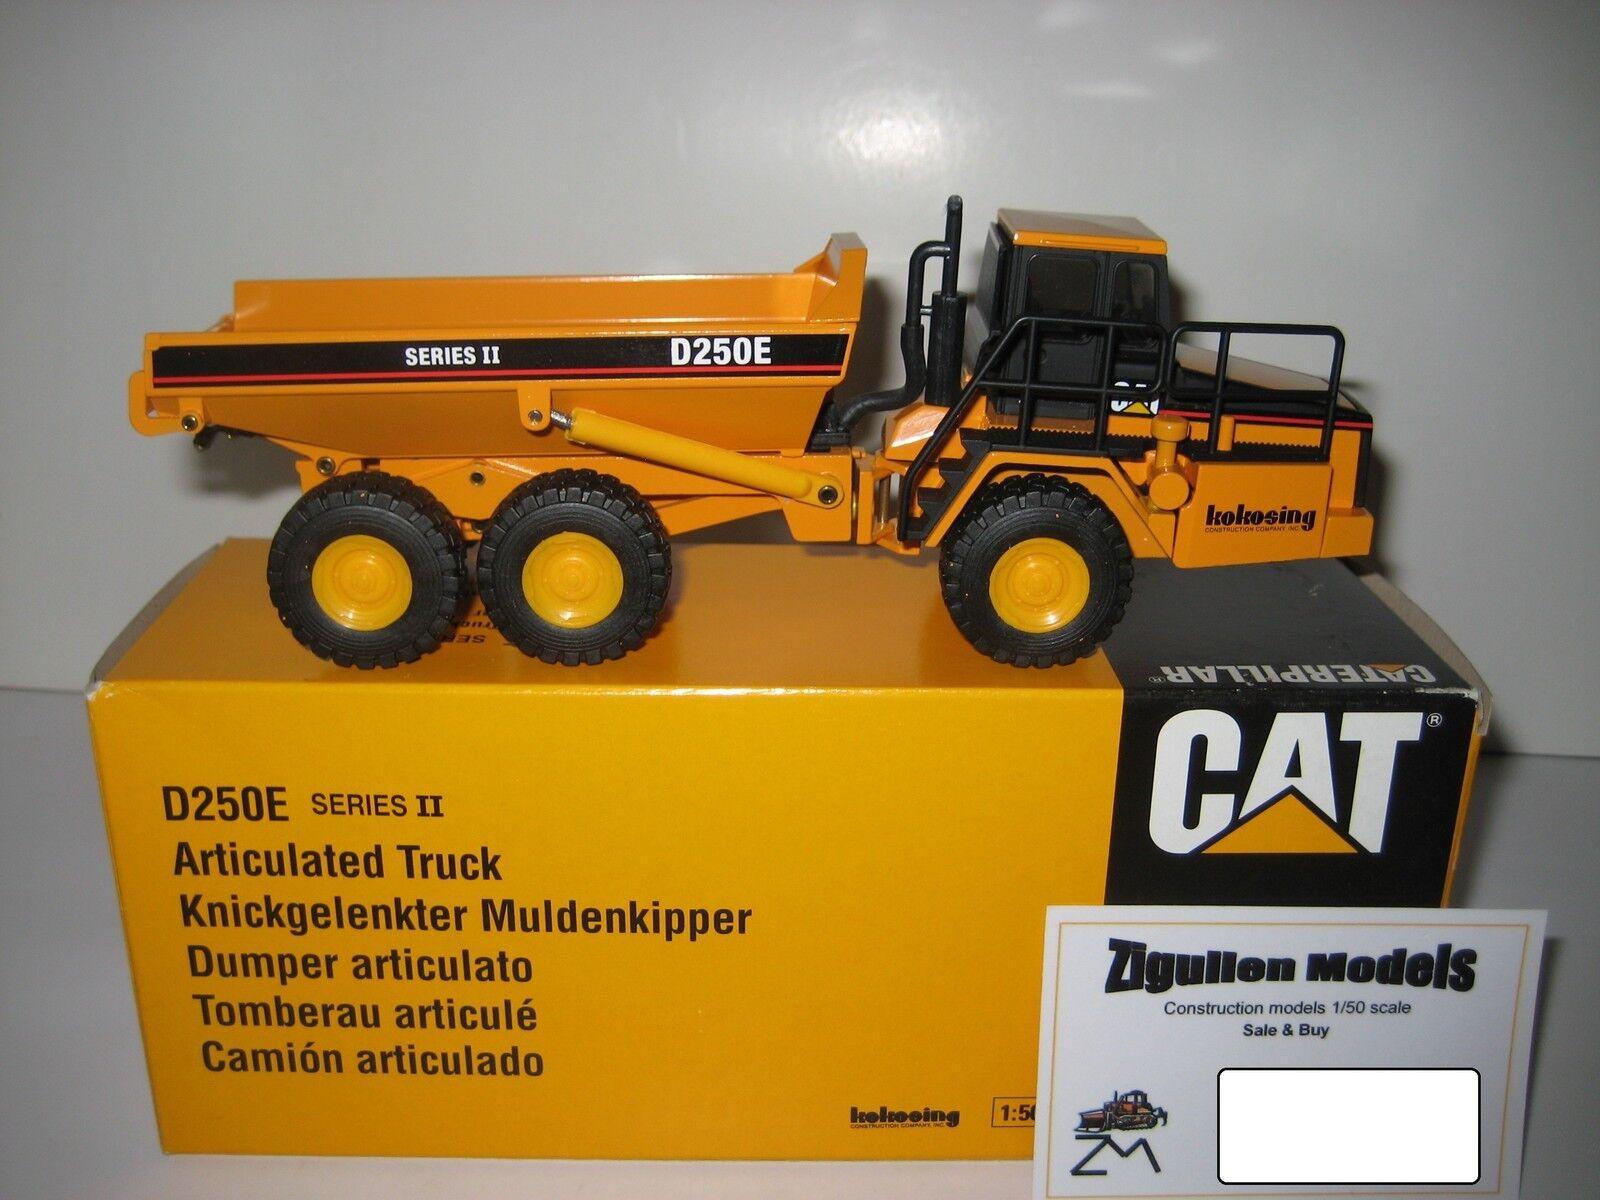 Caterpillar D 250 E tombereaux KOKOSING  4131 NZG 1 50 neuf dans sa boîte